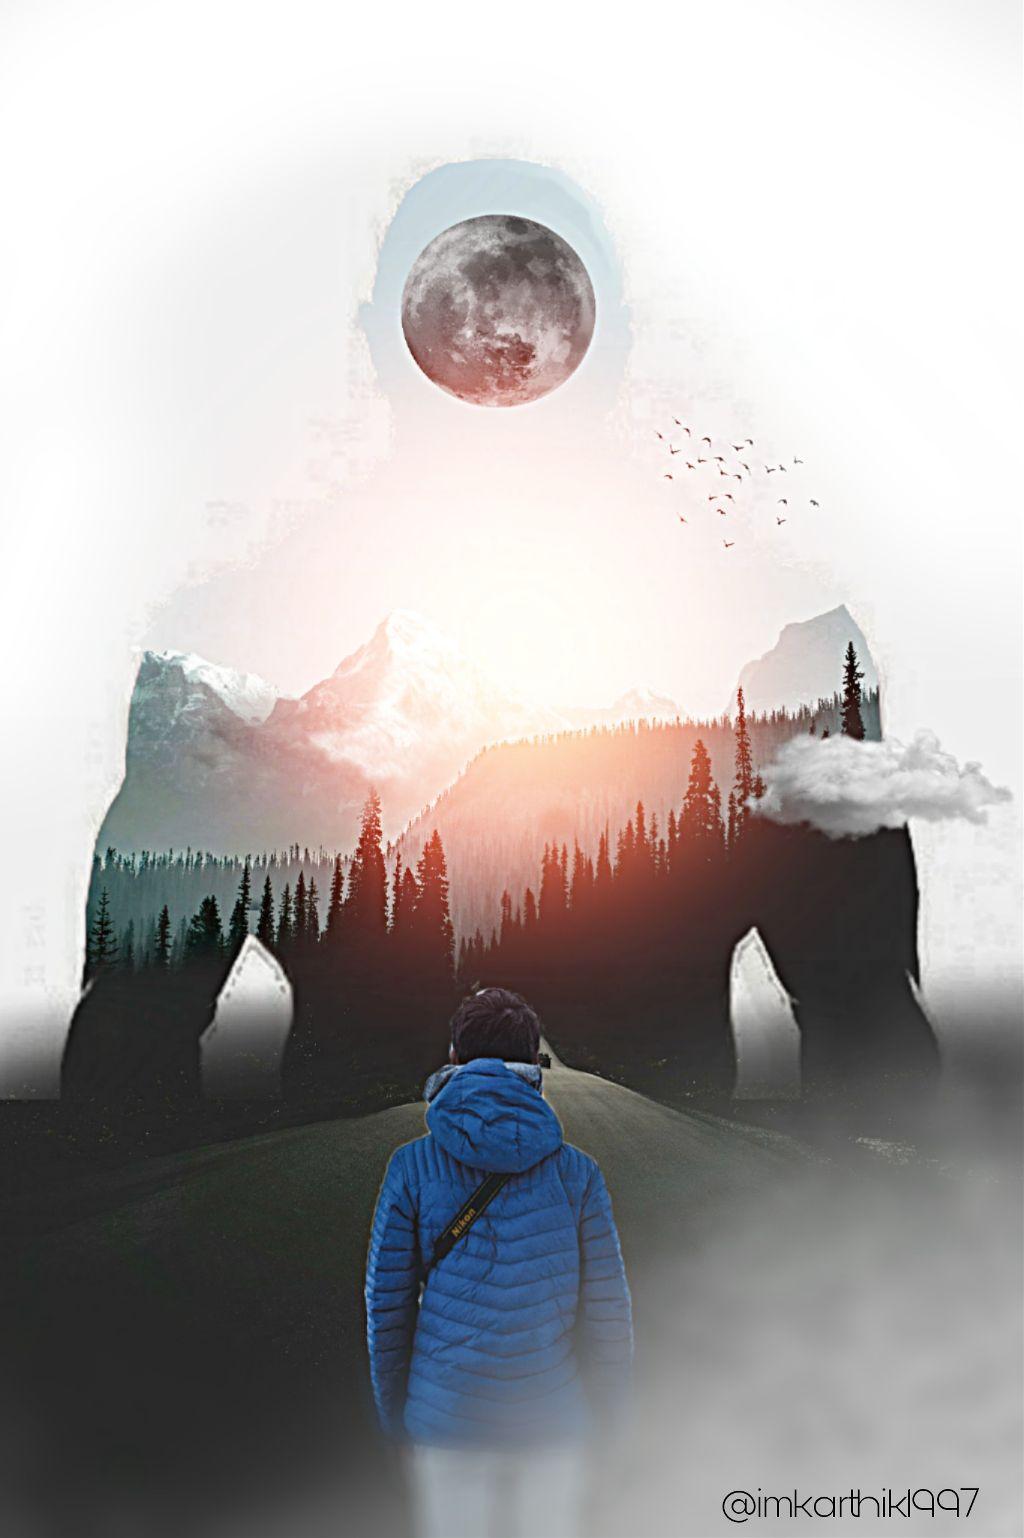 Instagram 👉 @imkarthik1997  #madewithpicsart #madebyme  #art #artist #Photo #photography #photomanipulation #edit #nature #moon #landscape #nature #naturephotography #FreeToEdit #RemixIt #edited #editedbyme #picsart #clouds #Mountains #picoftheday #photo